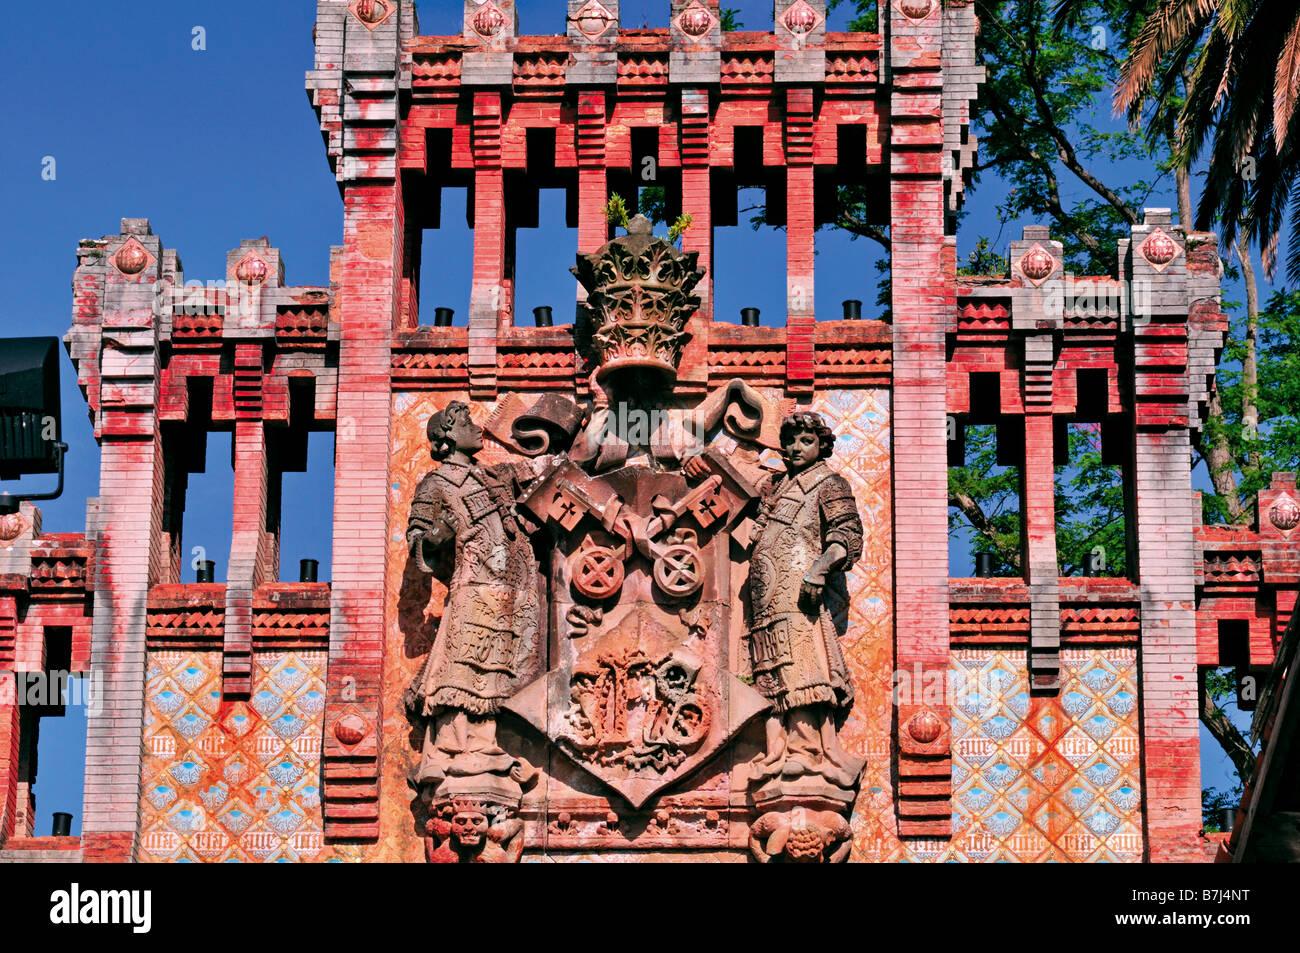 Historical portal of the Universidad Pontificia in Comillas - Stock Image